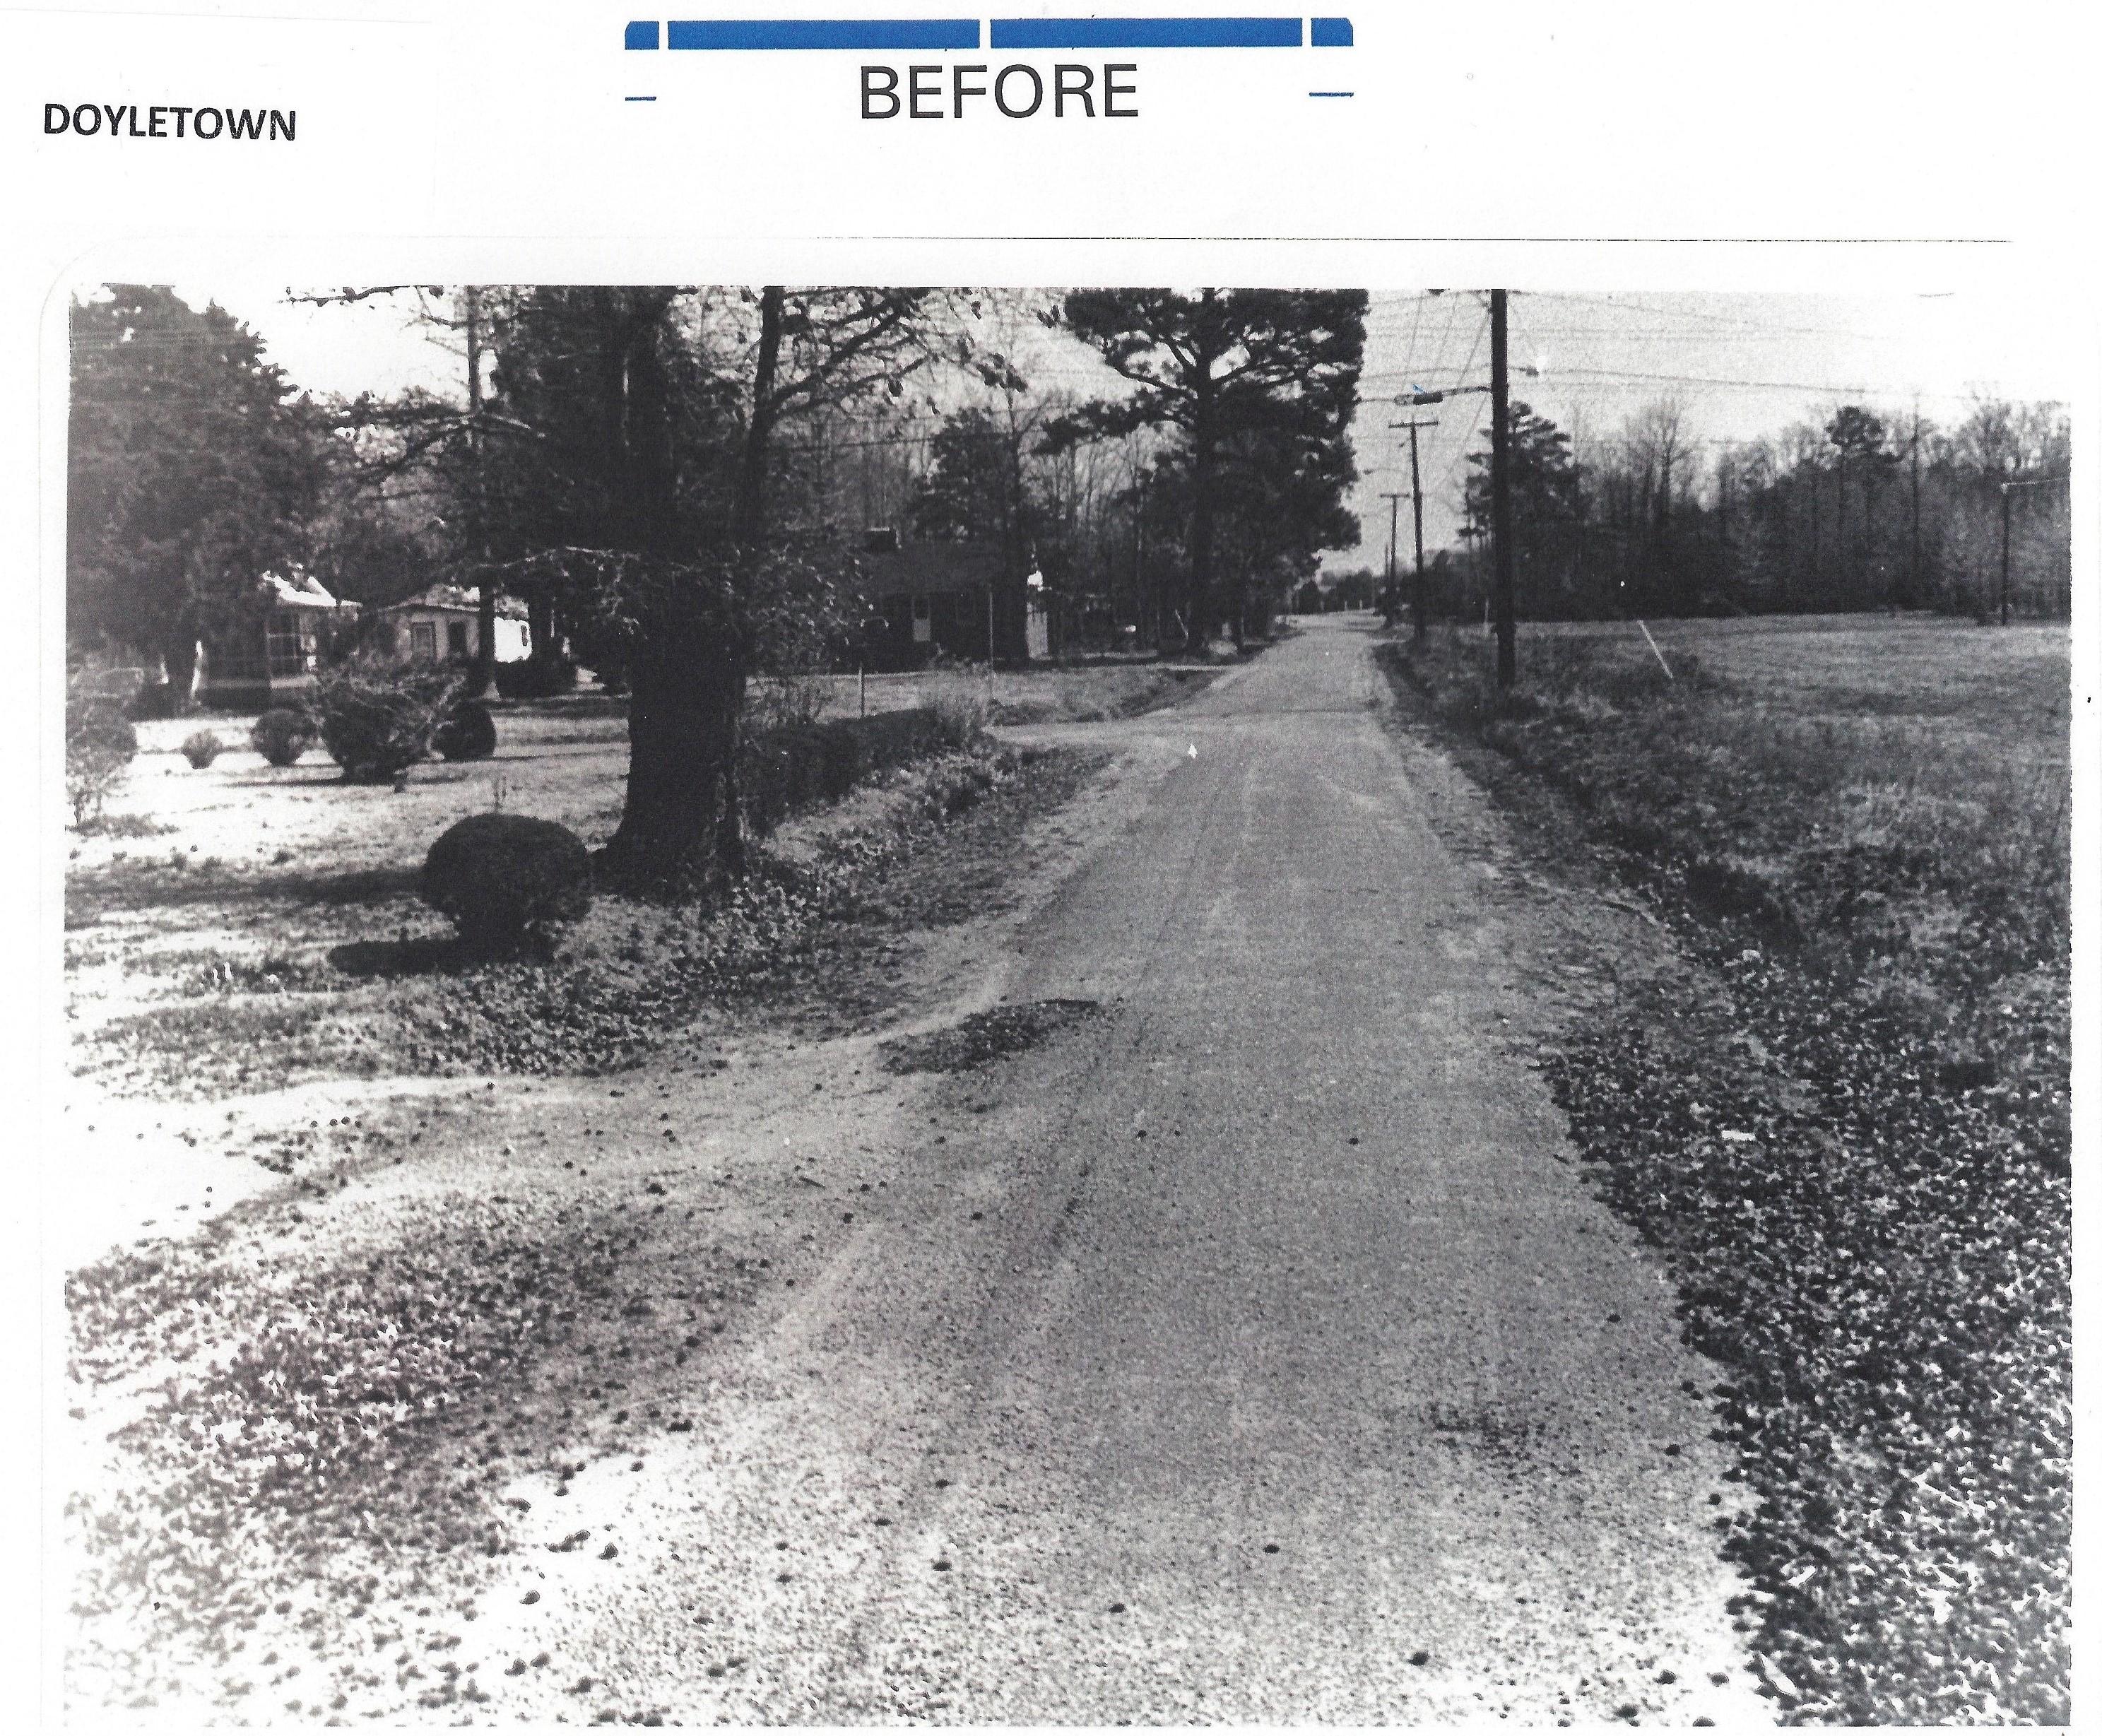 Doyletown Before